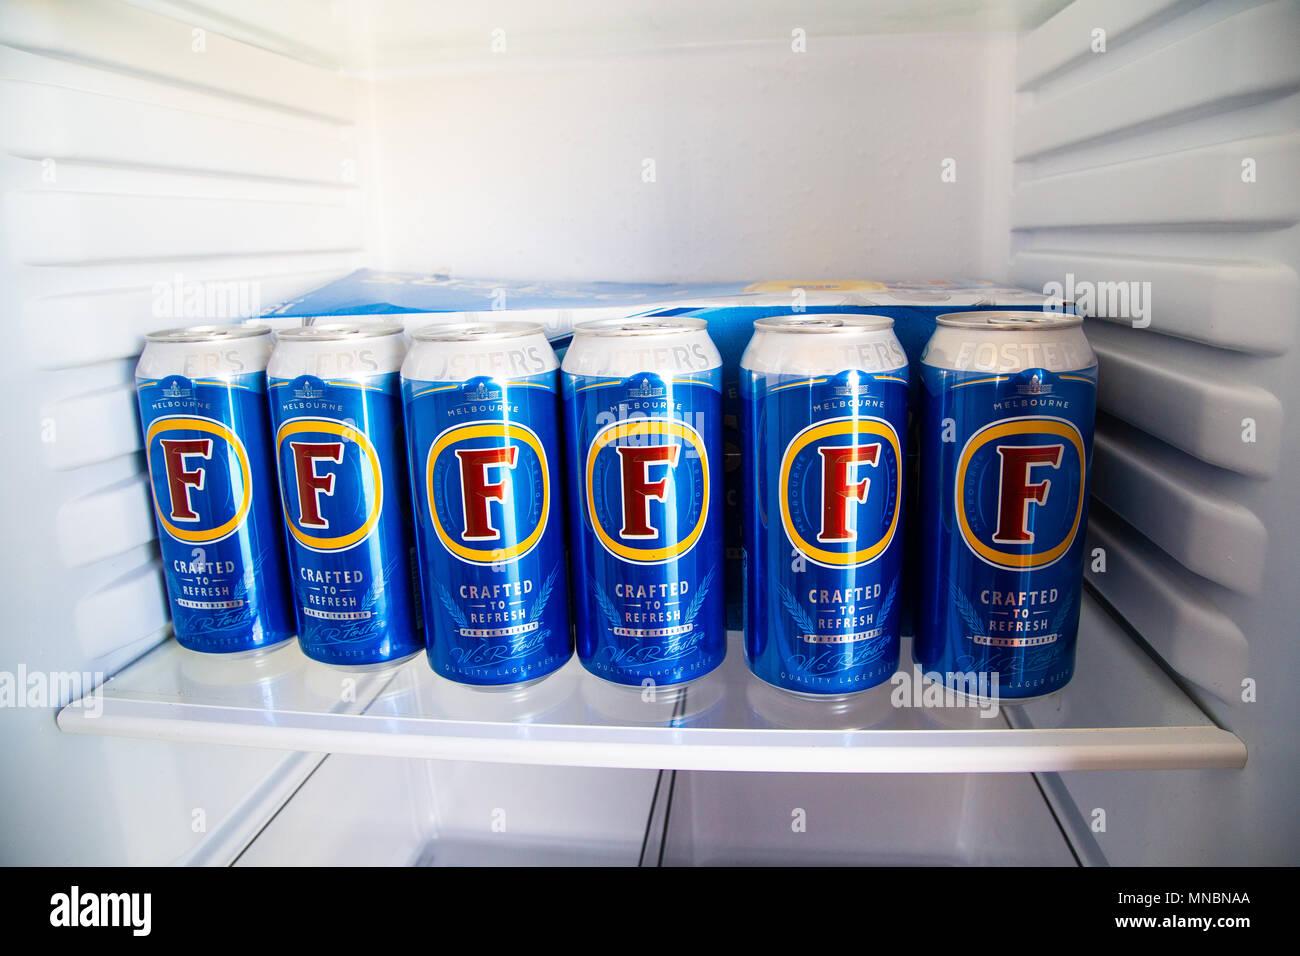 Kühlschrank Dose : Kühlschrank schwarz u gastro cool u günstig kühlen